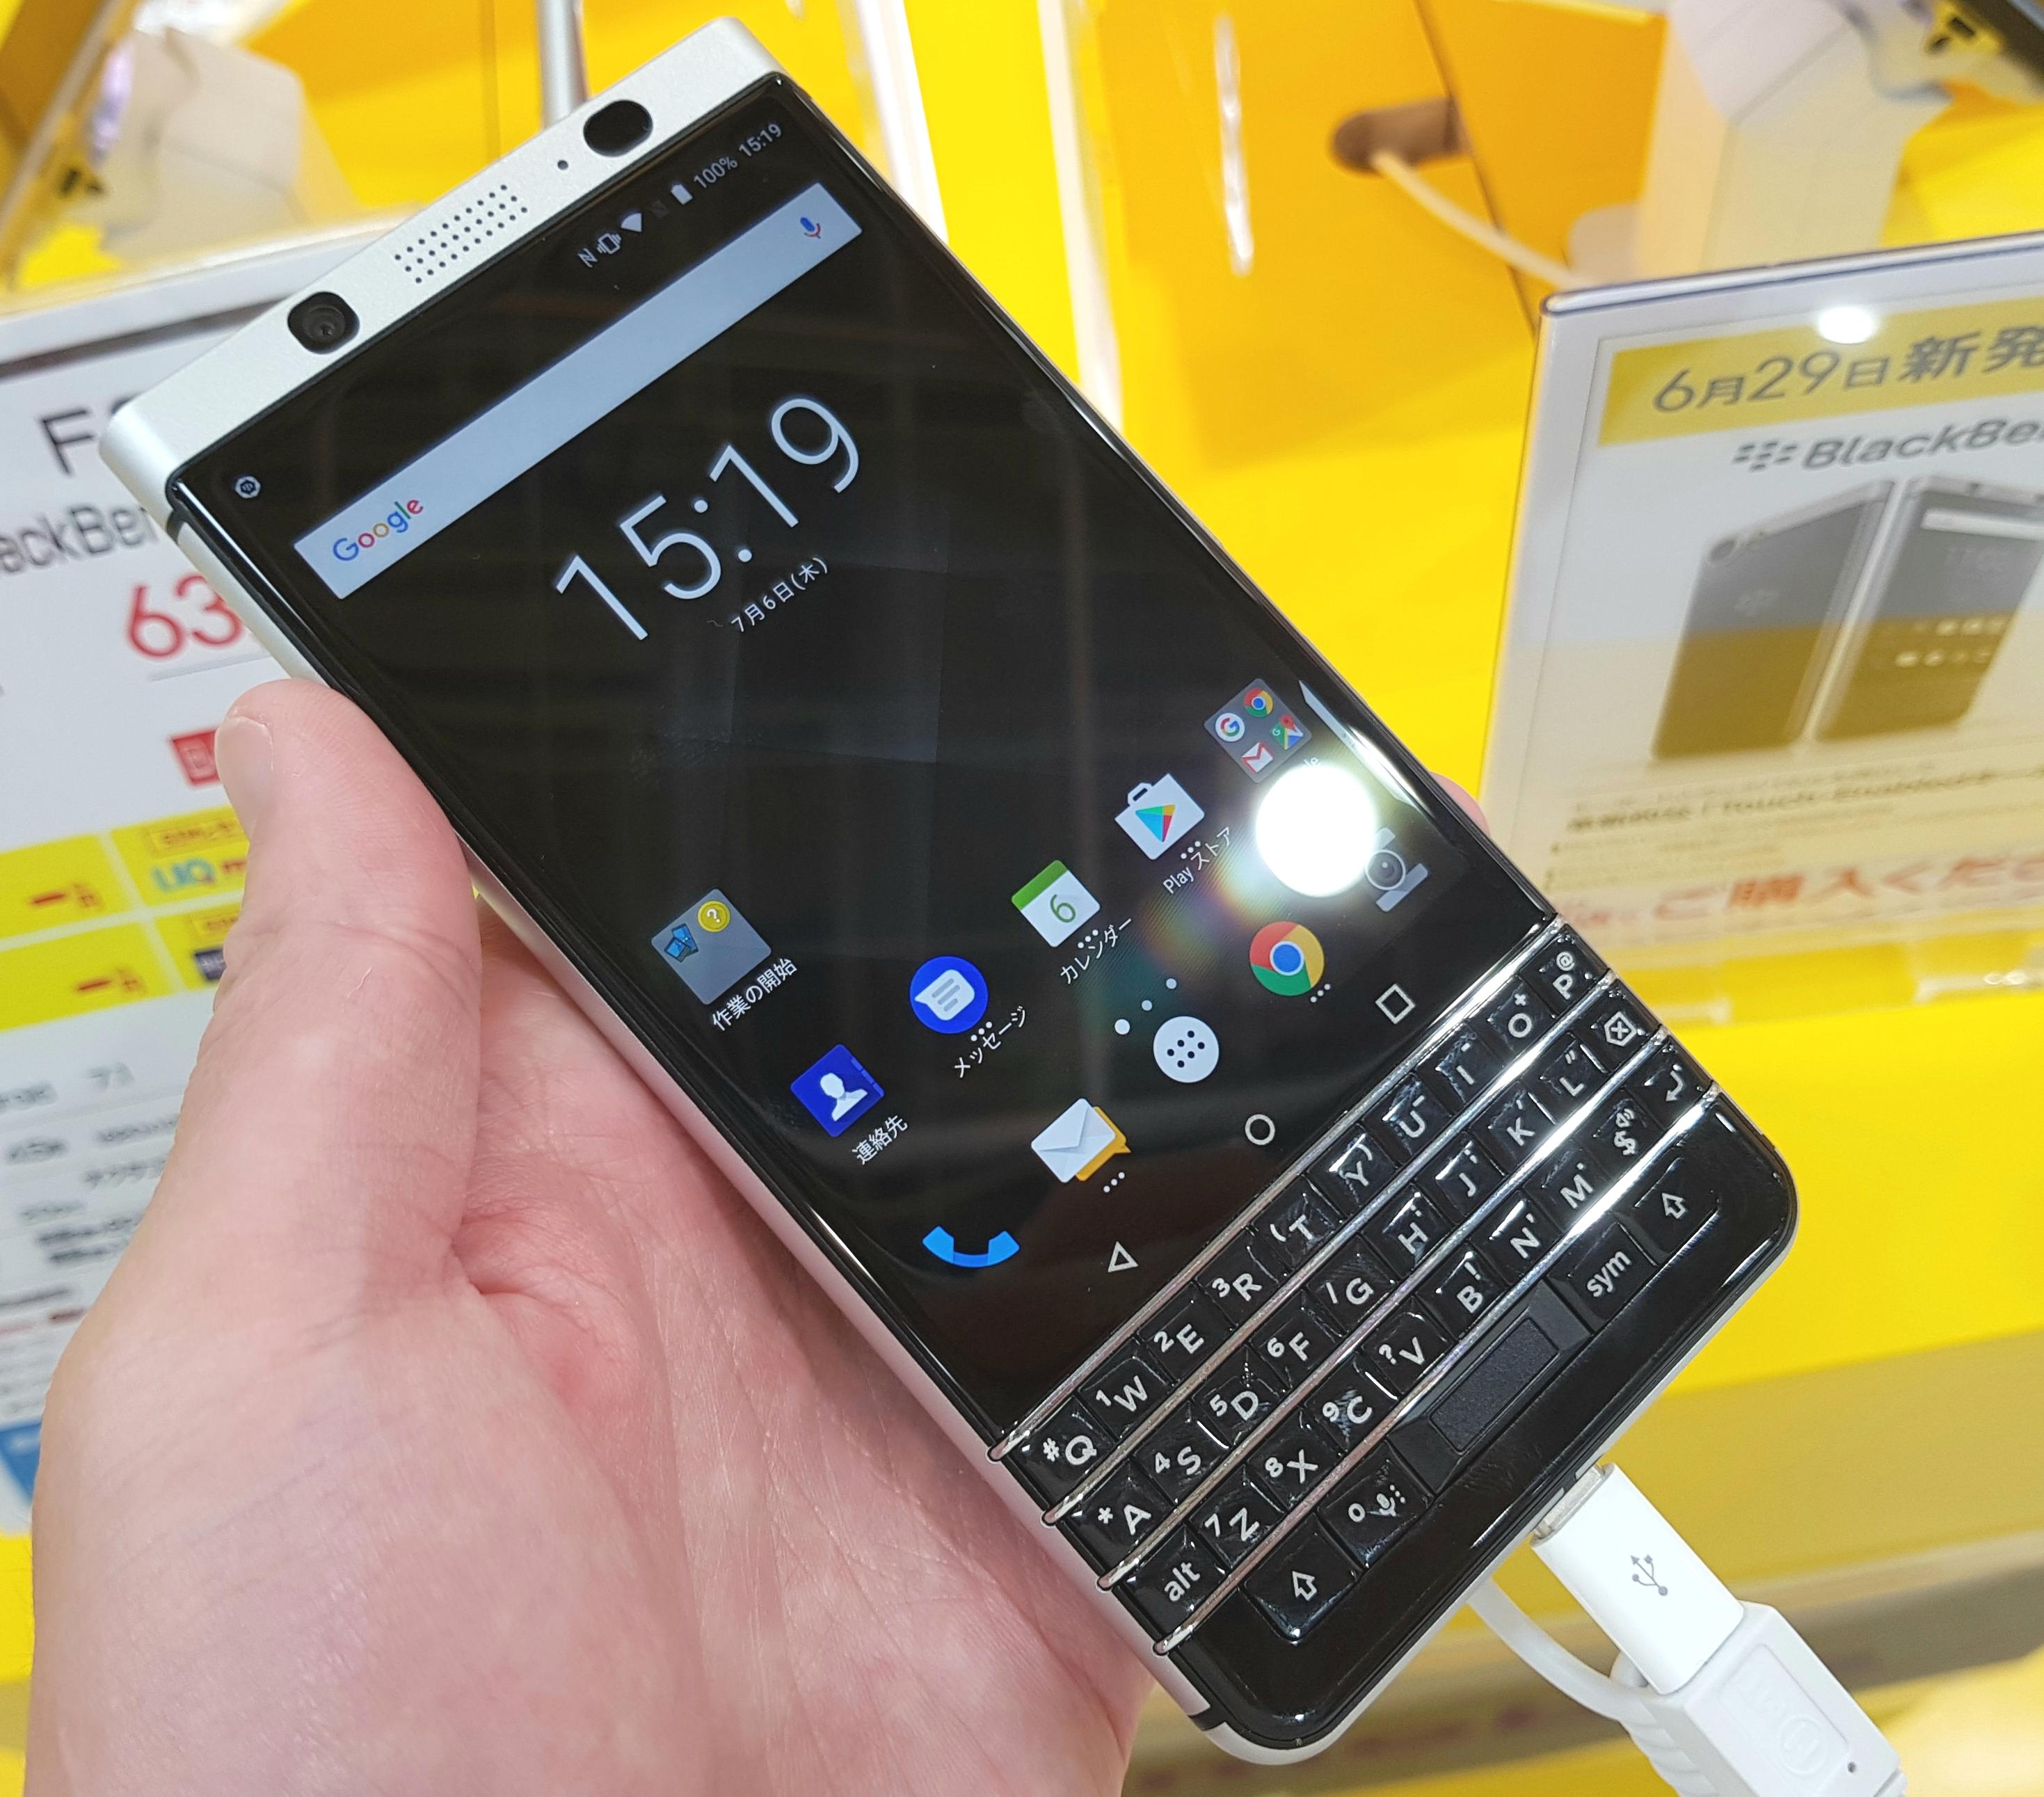 BlackBerry KEYoneがカッコ良すぎた件について